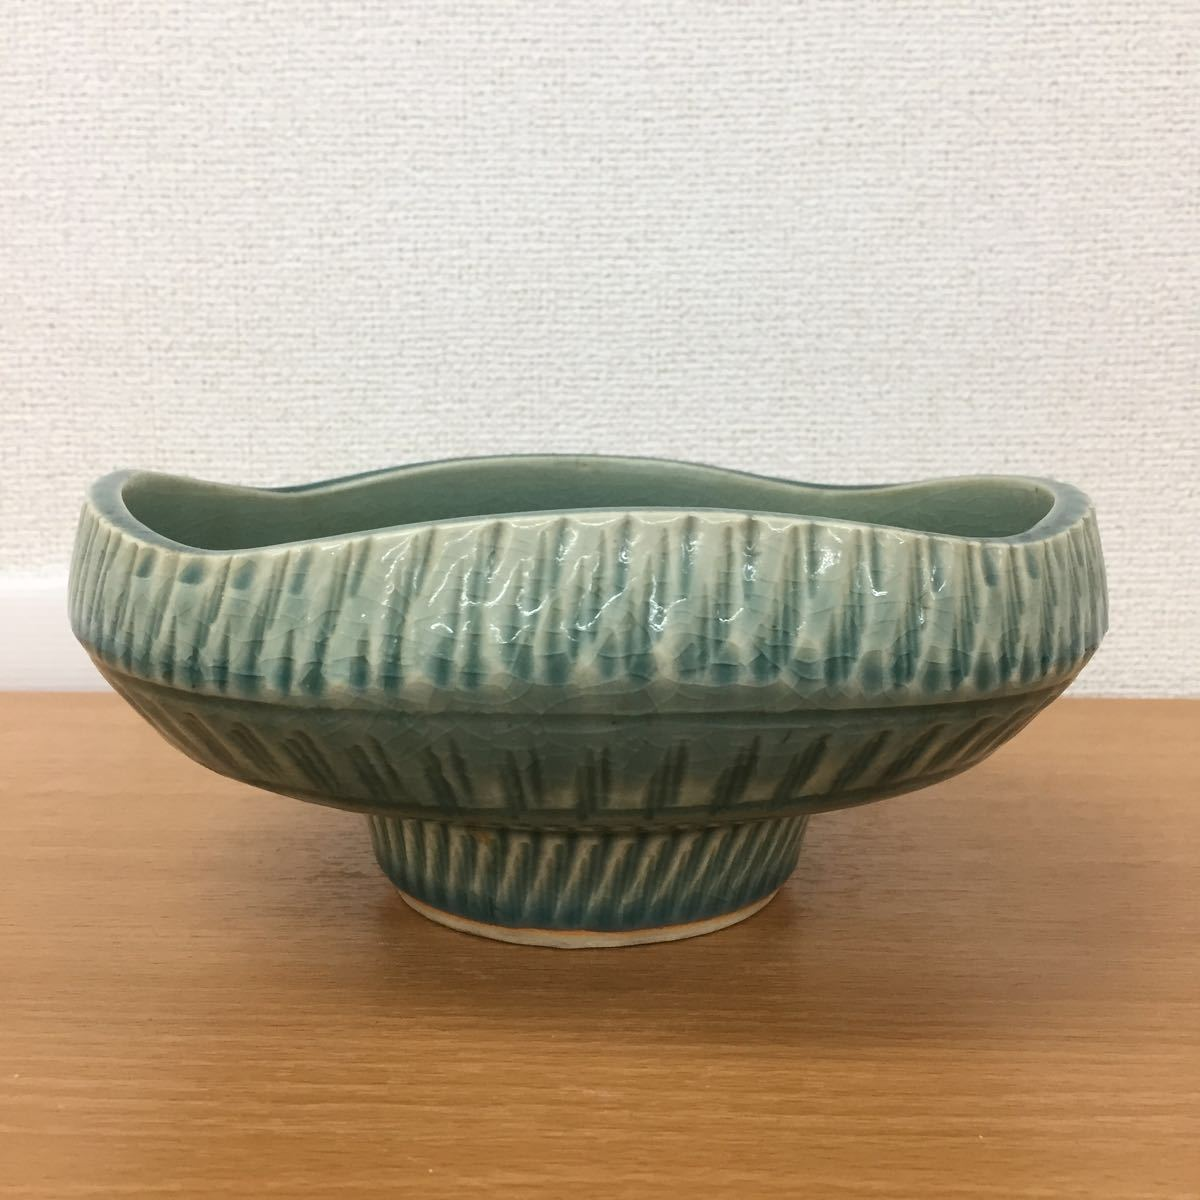 MK0227】中古品 陶器 花器 生花 盆栽_画像3